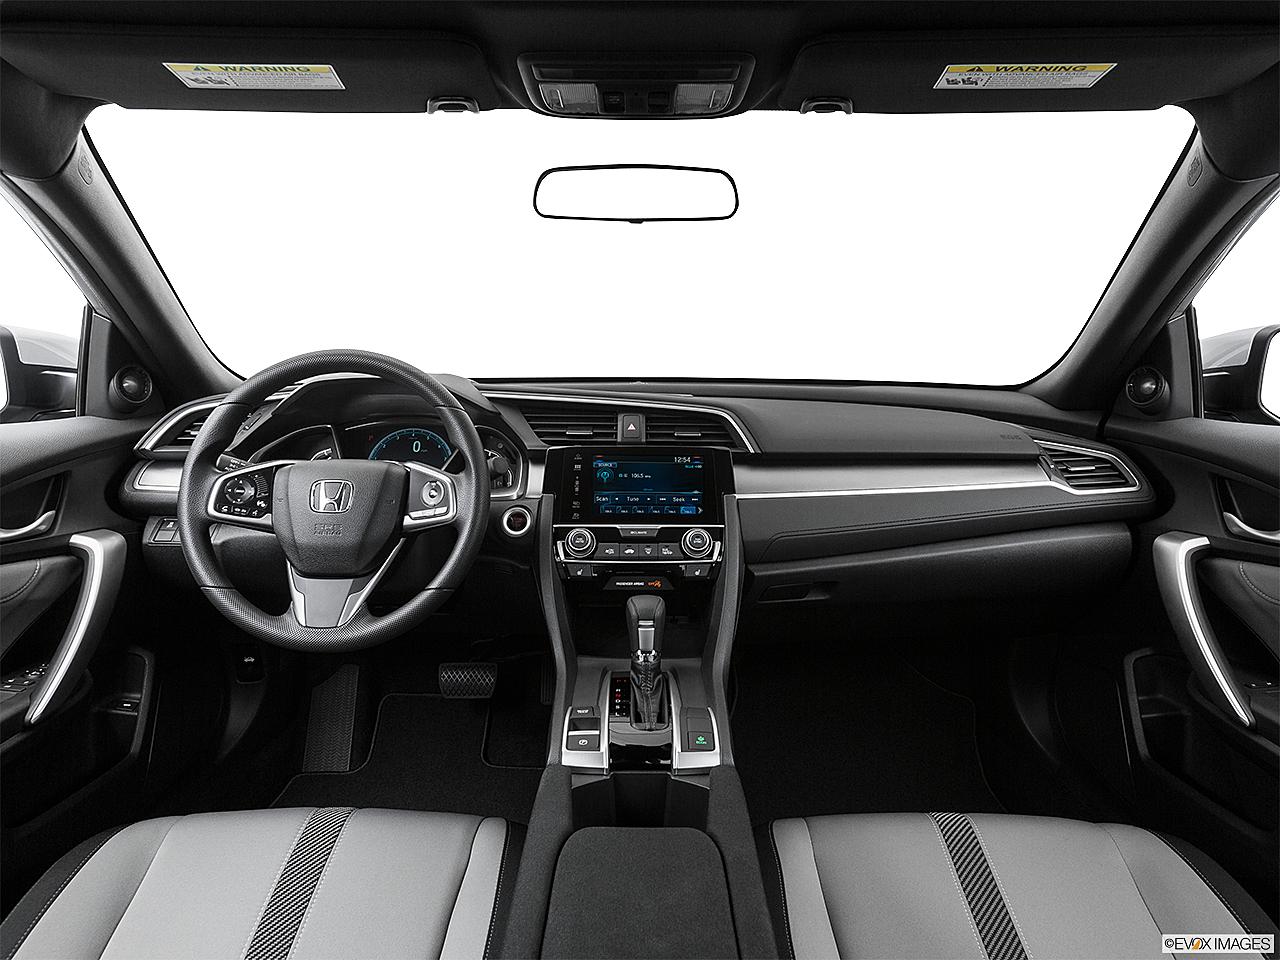 2017 Honda Civic Ex T Centered Wide Dash Shot